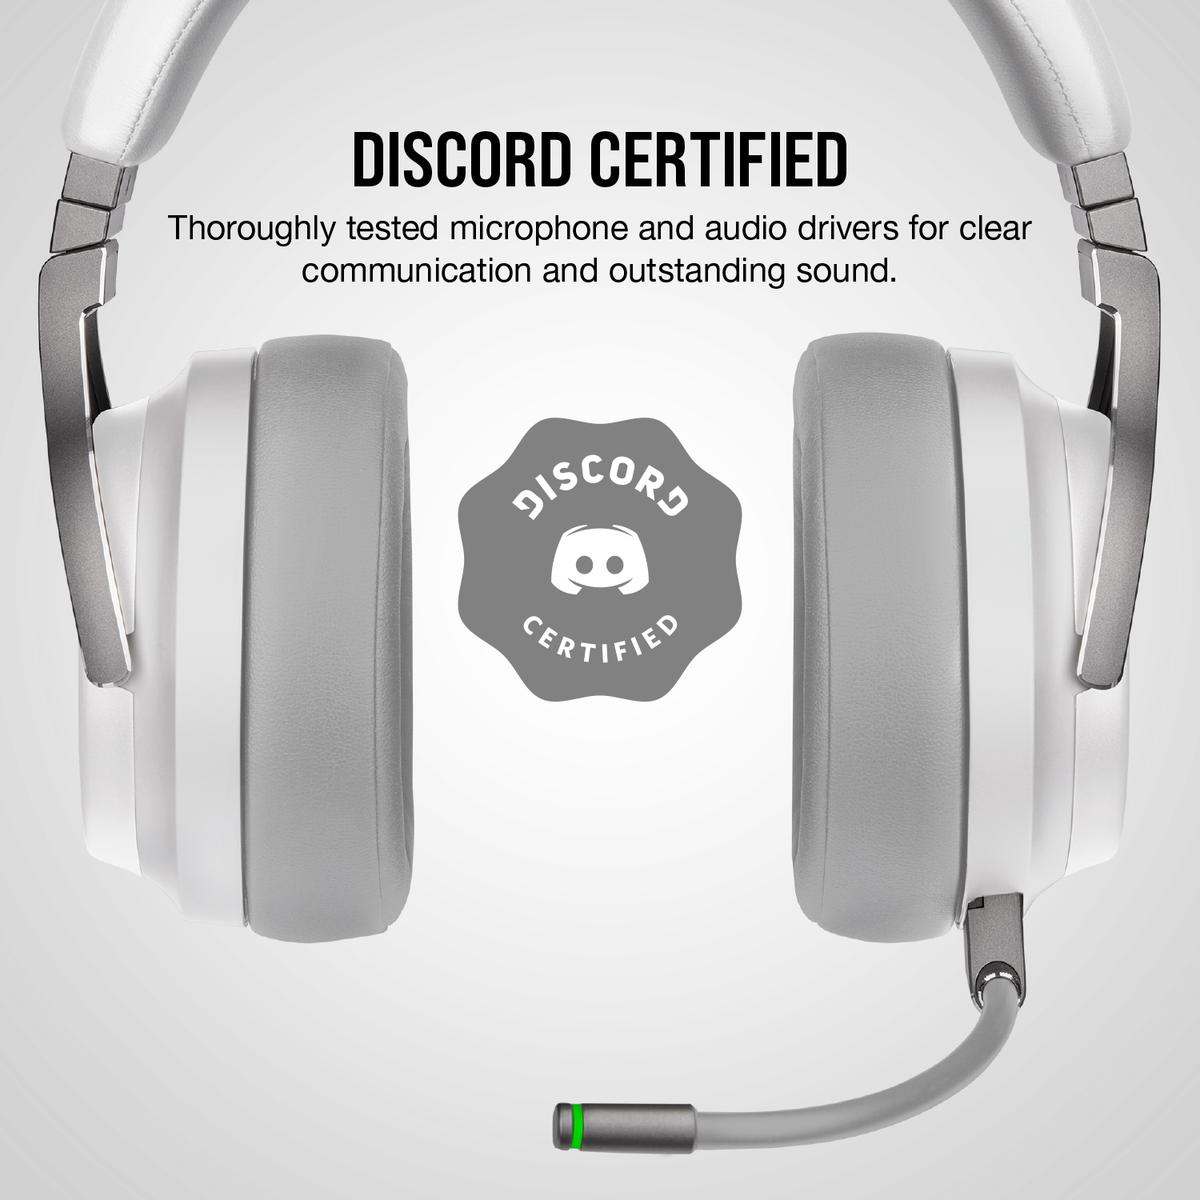 Corsair Virtuoso RGB Wireless Gaming Headset สีขาว ของแท้ ประกันศูนย์ 2ปี (White)